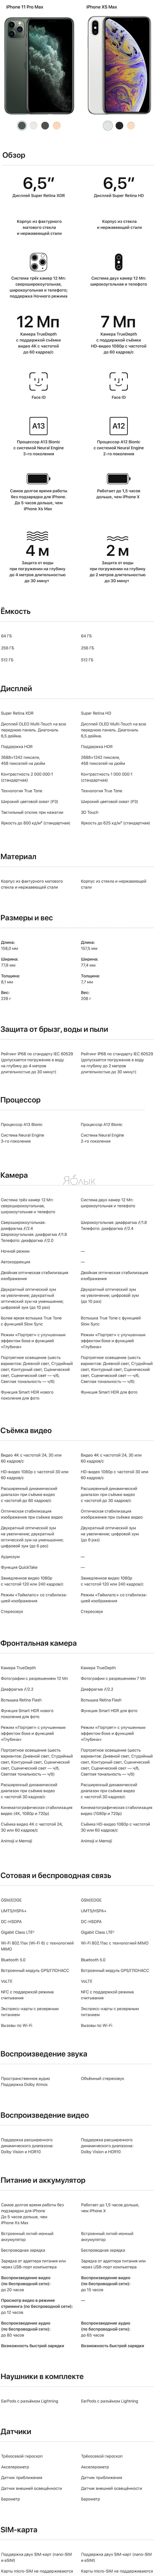 Сравнение технических характеристик (спецификаций) iPhone 11 Pro Max и iPhone XS Max